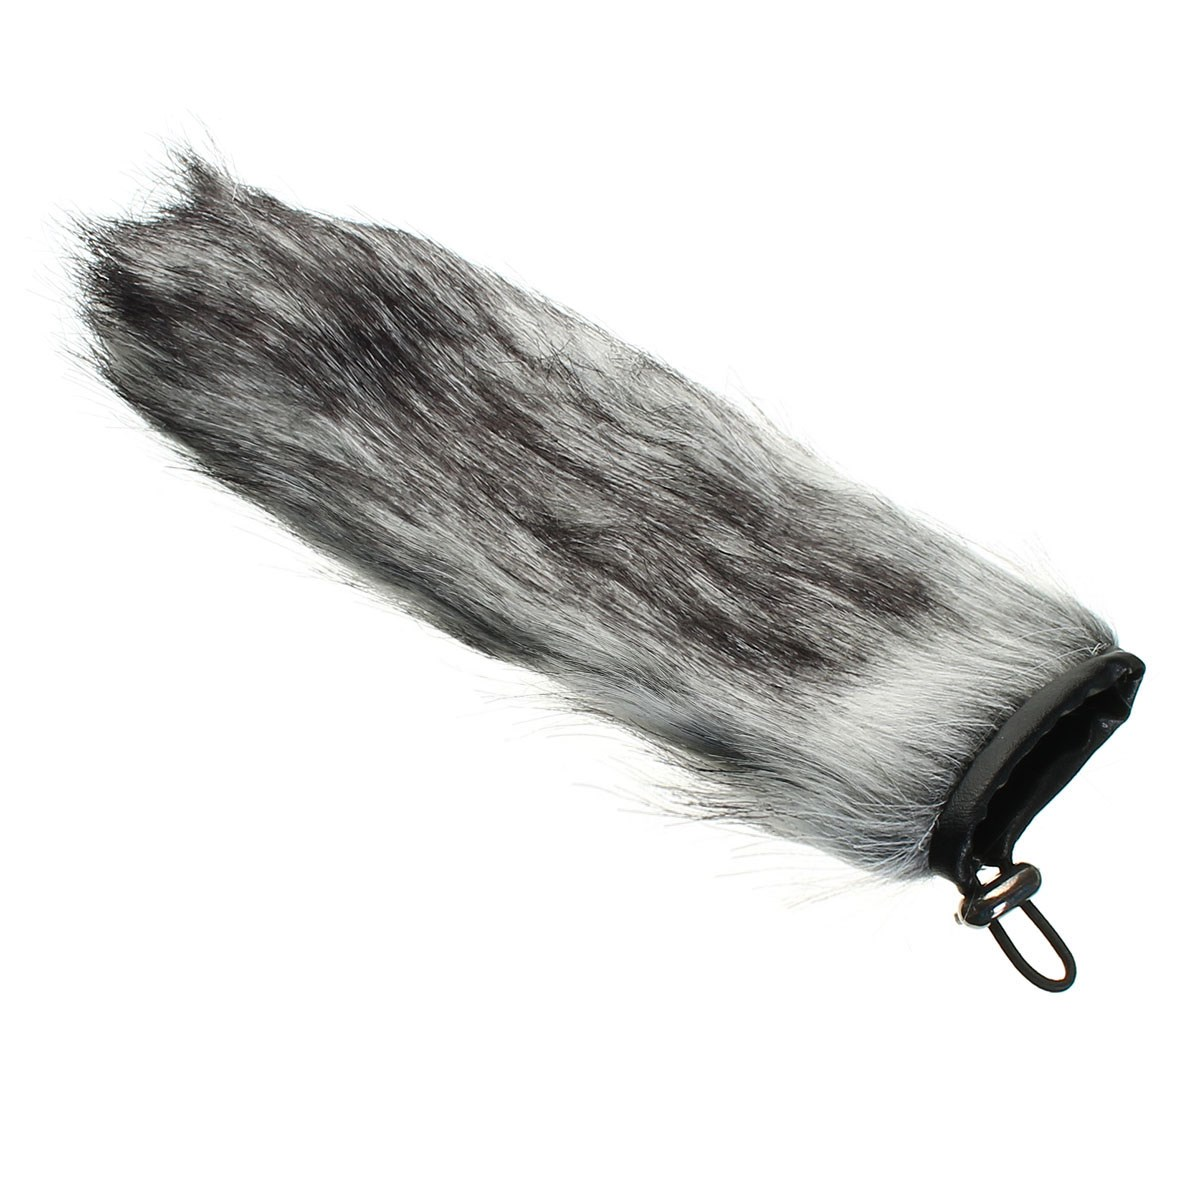 New Microphone Artificial Soft Fur Windscreen Wind Cutter Cover Case Windshield For Professional Mic Microphone 12cm 15cm 22cm